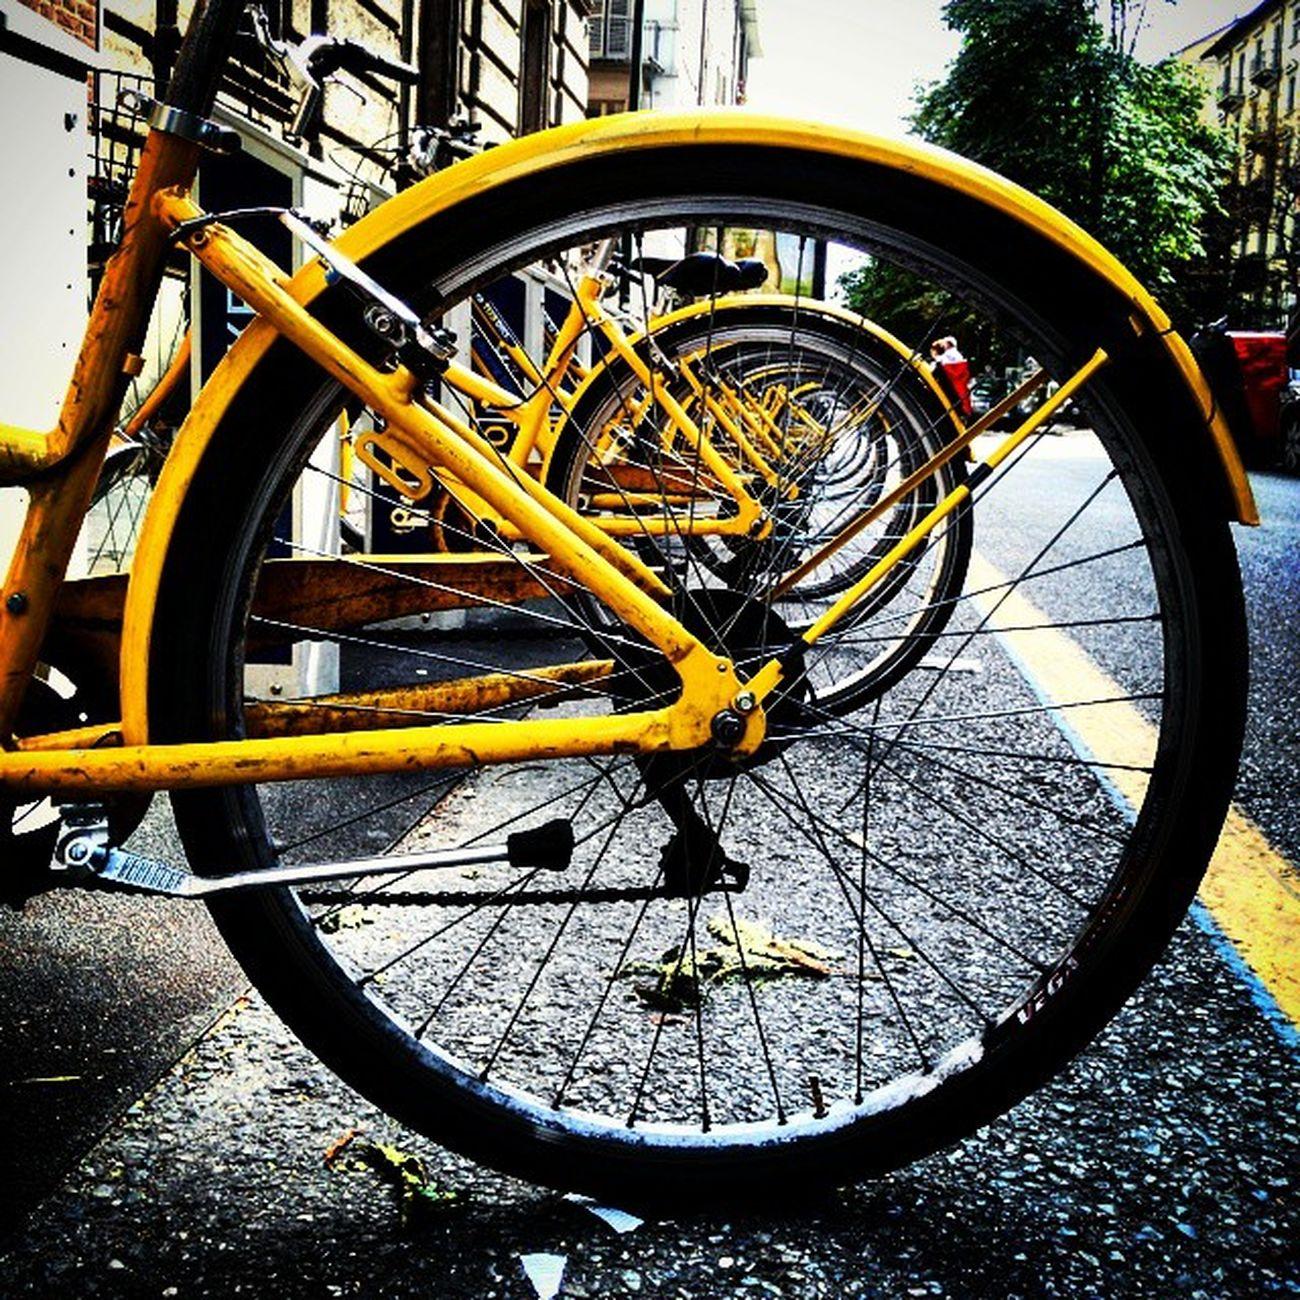 Wheells Bycicles Bycicles Turin Bike Bikelife Torinodigitale Torino Publicbikes Wheel Ig_asti_